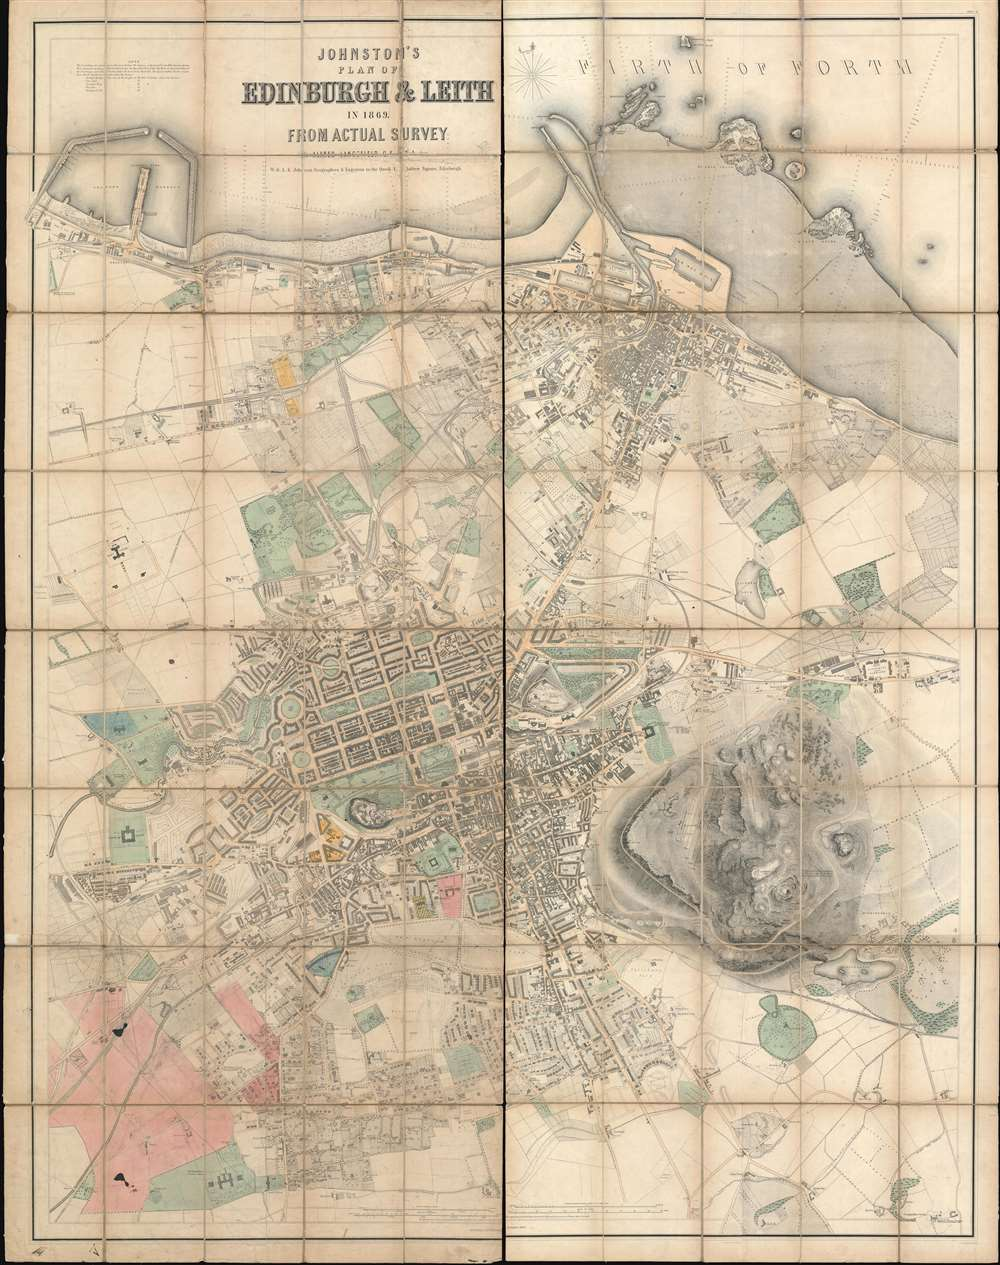 1869 Johnston City Plan or Map of Edinburgh and Leith, Scotland